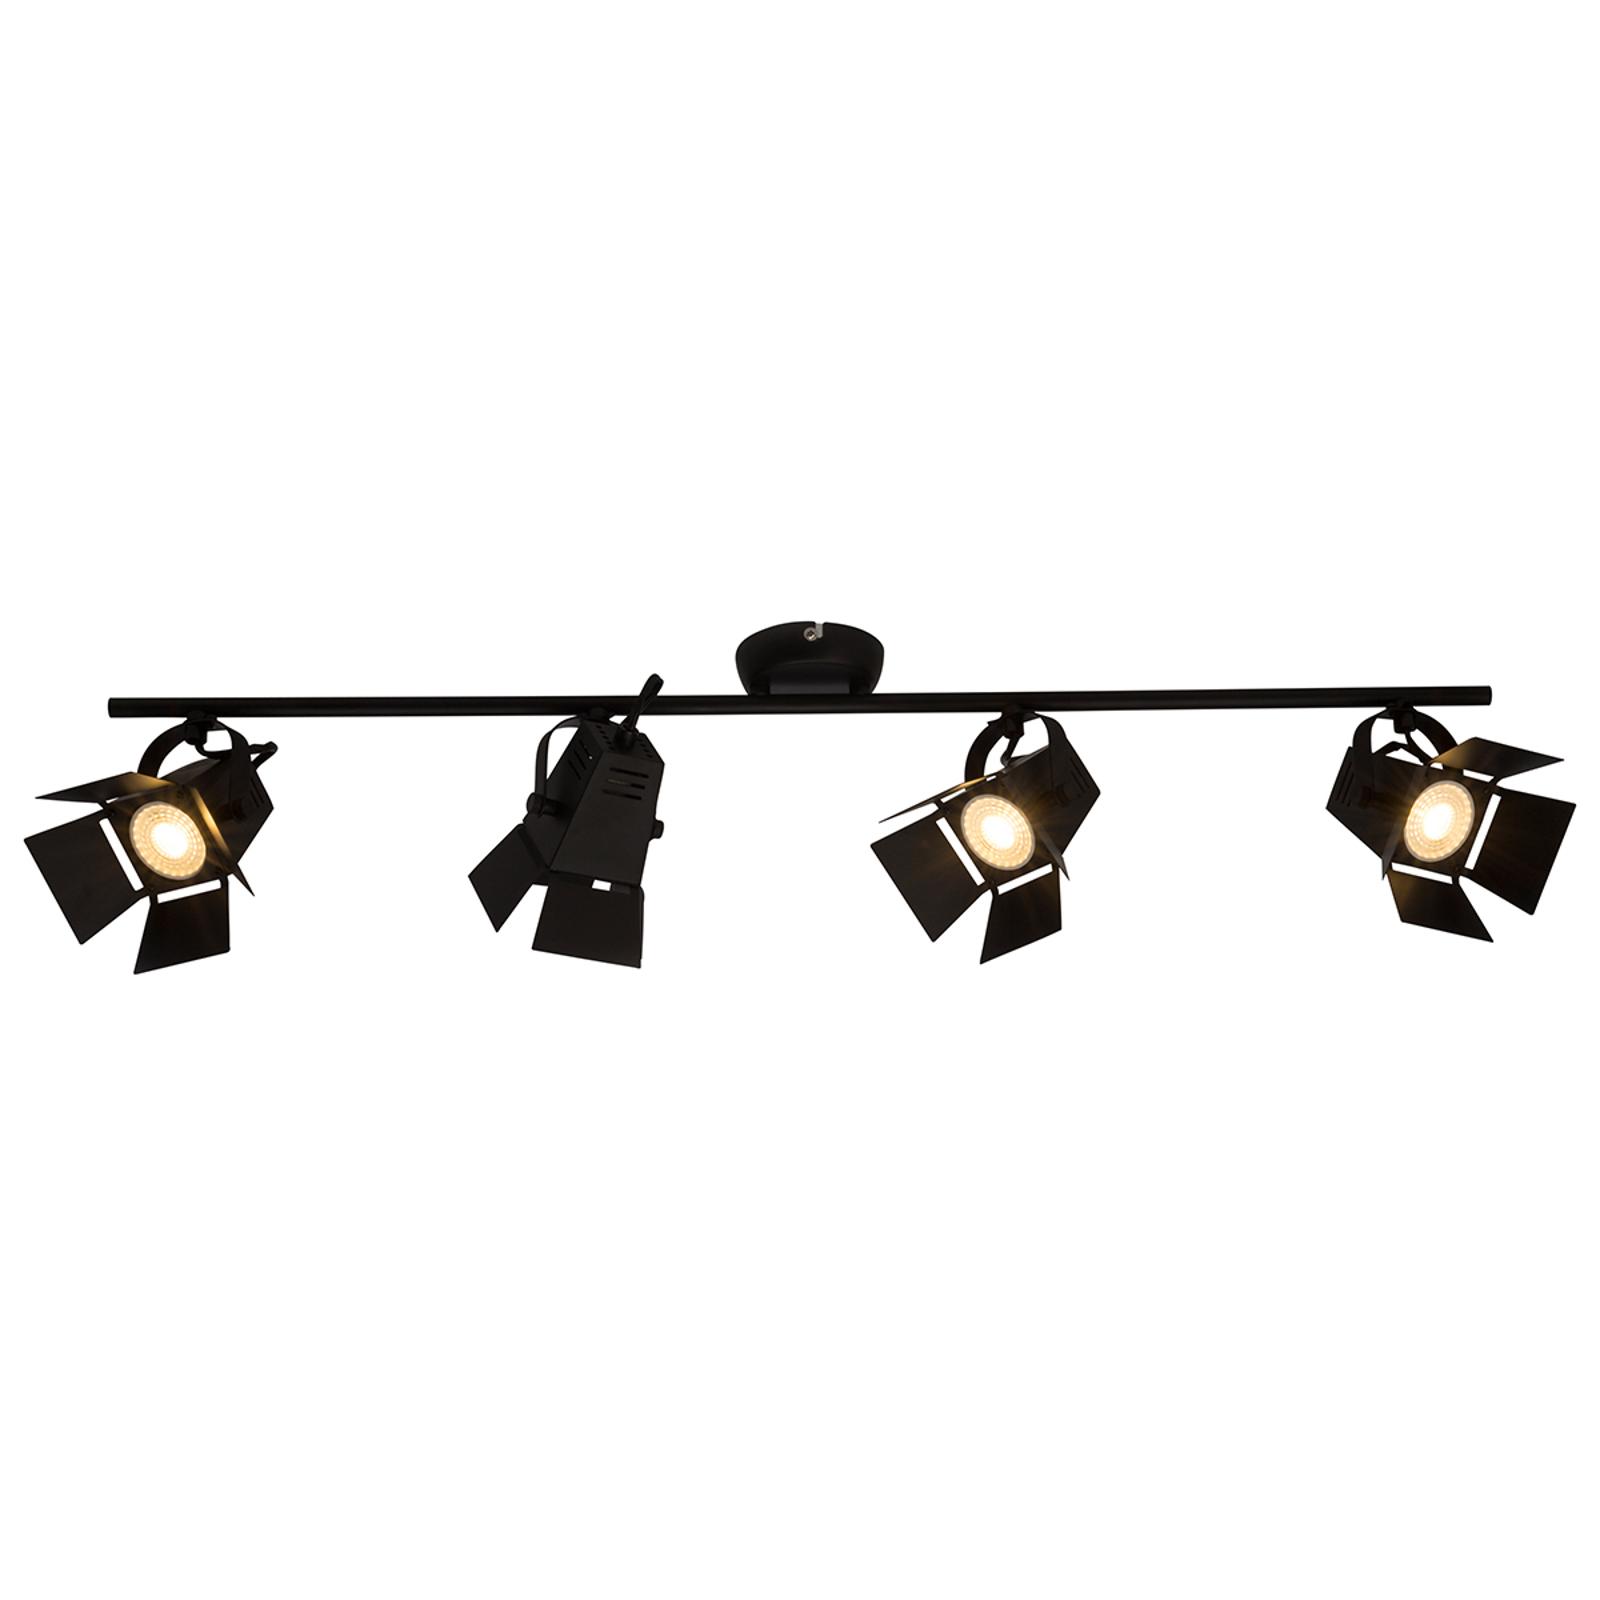 Lámpara LED de techo Movie moderna con foco negra